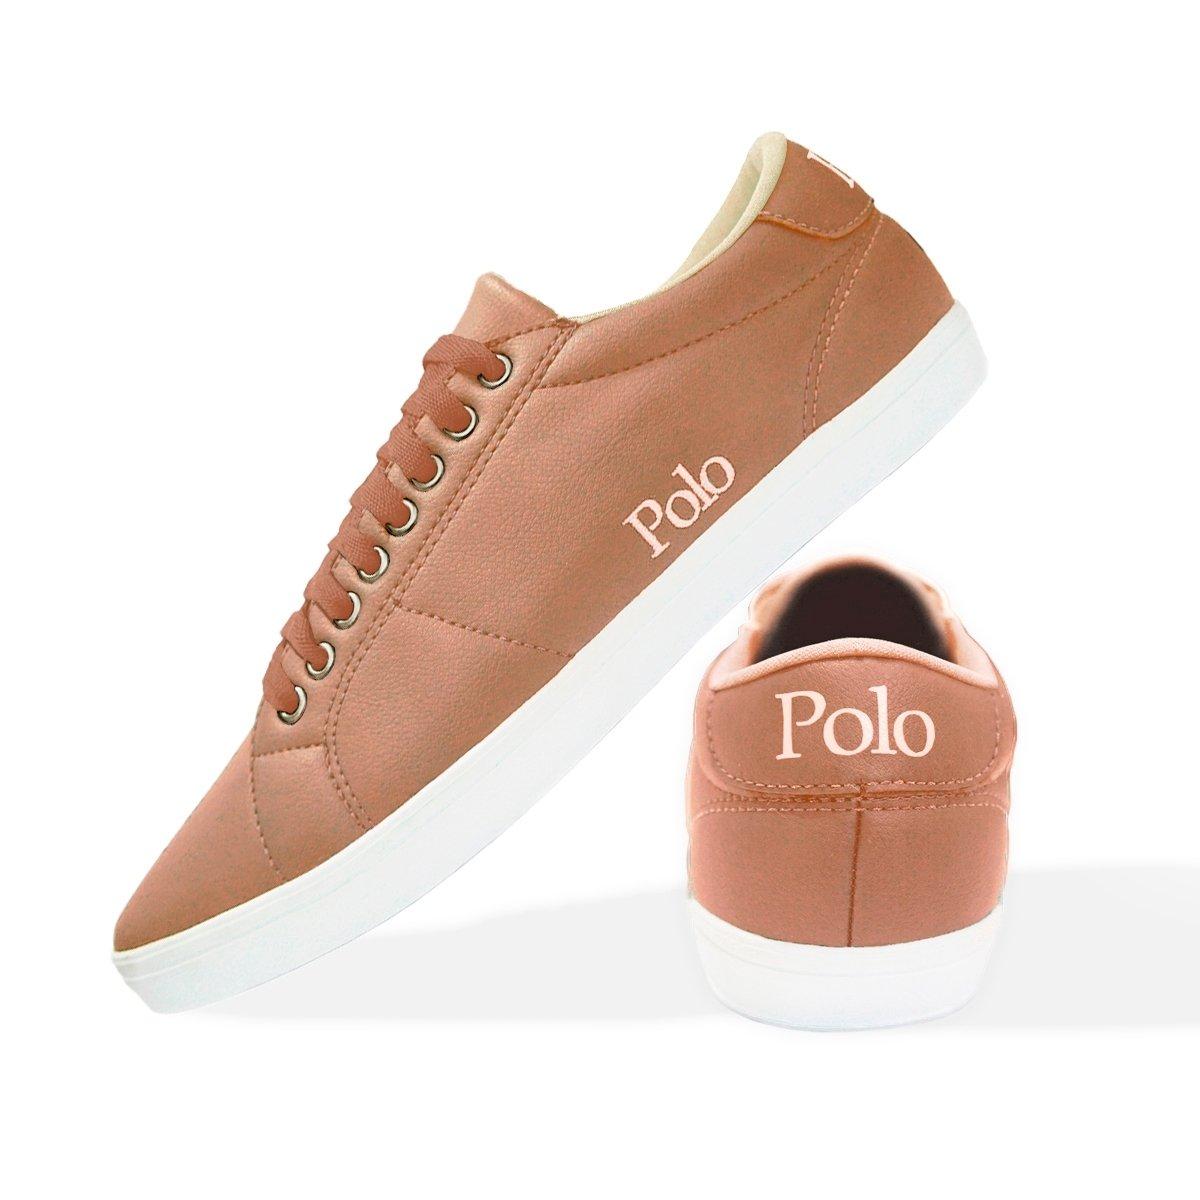 4b399ba3c6c60 Tênis Leeds Polo Match Masculino | Netshoes